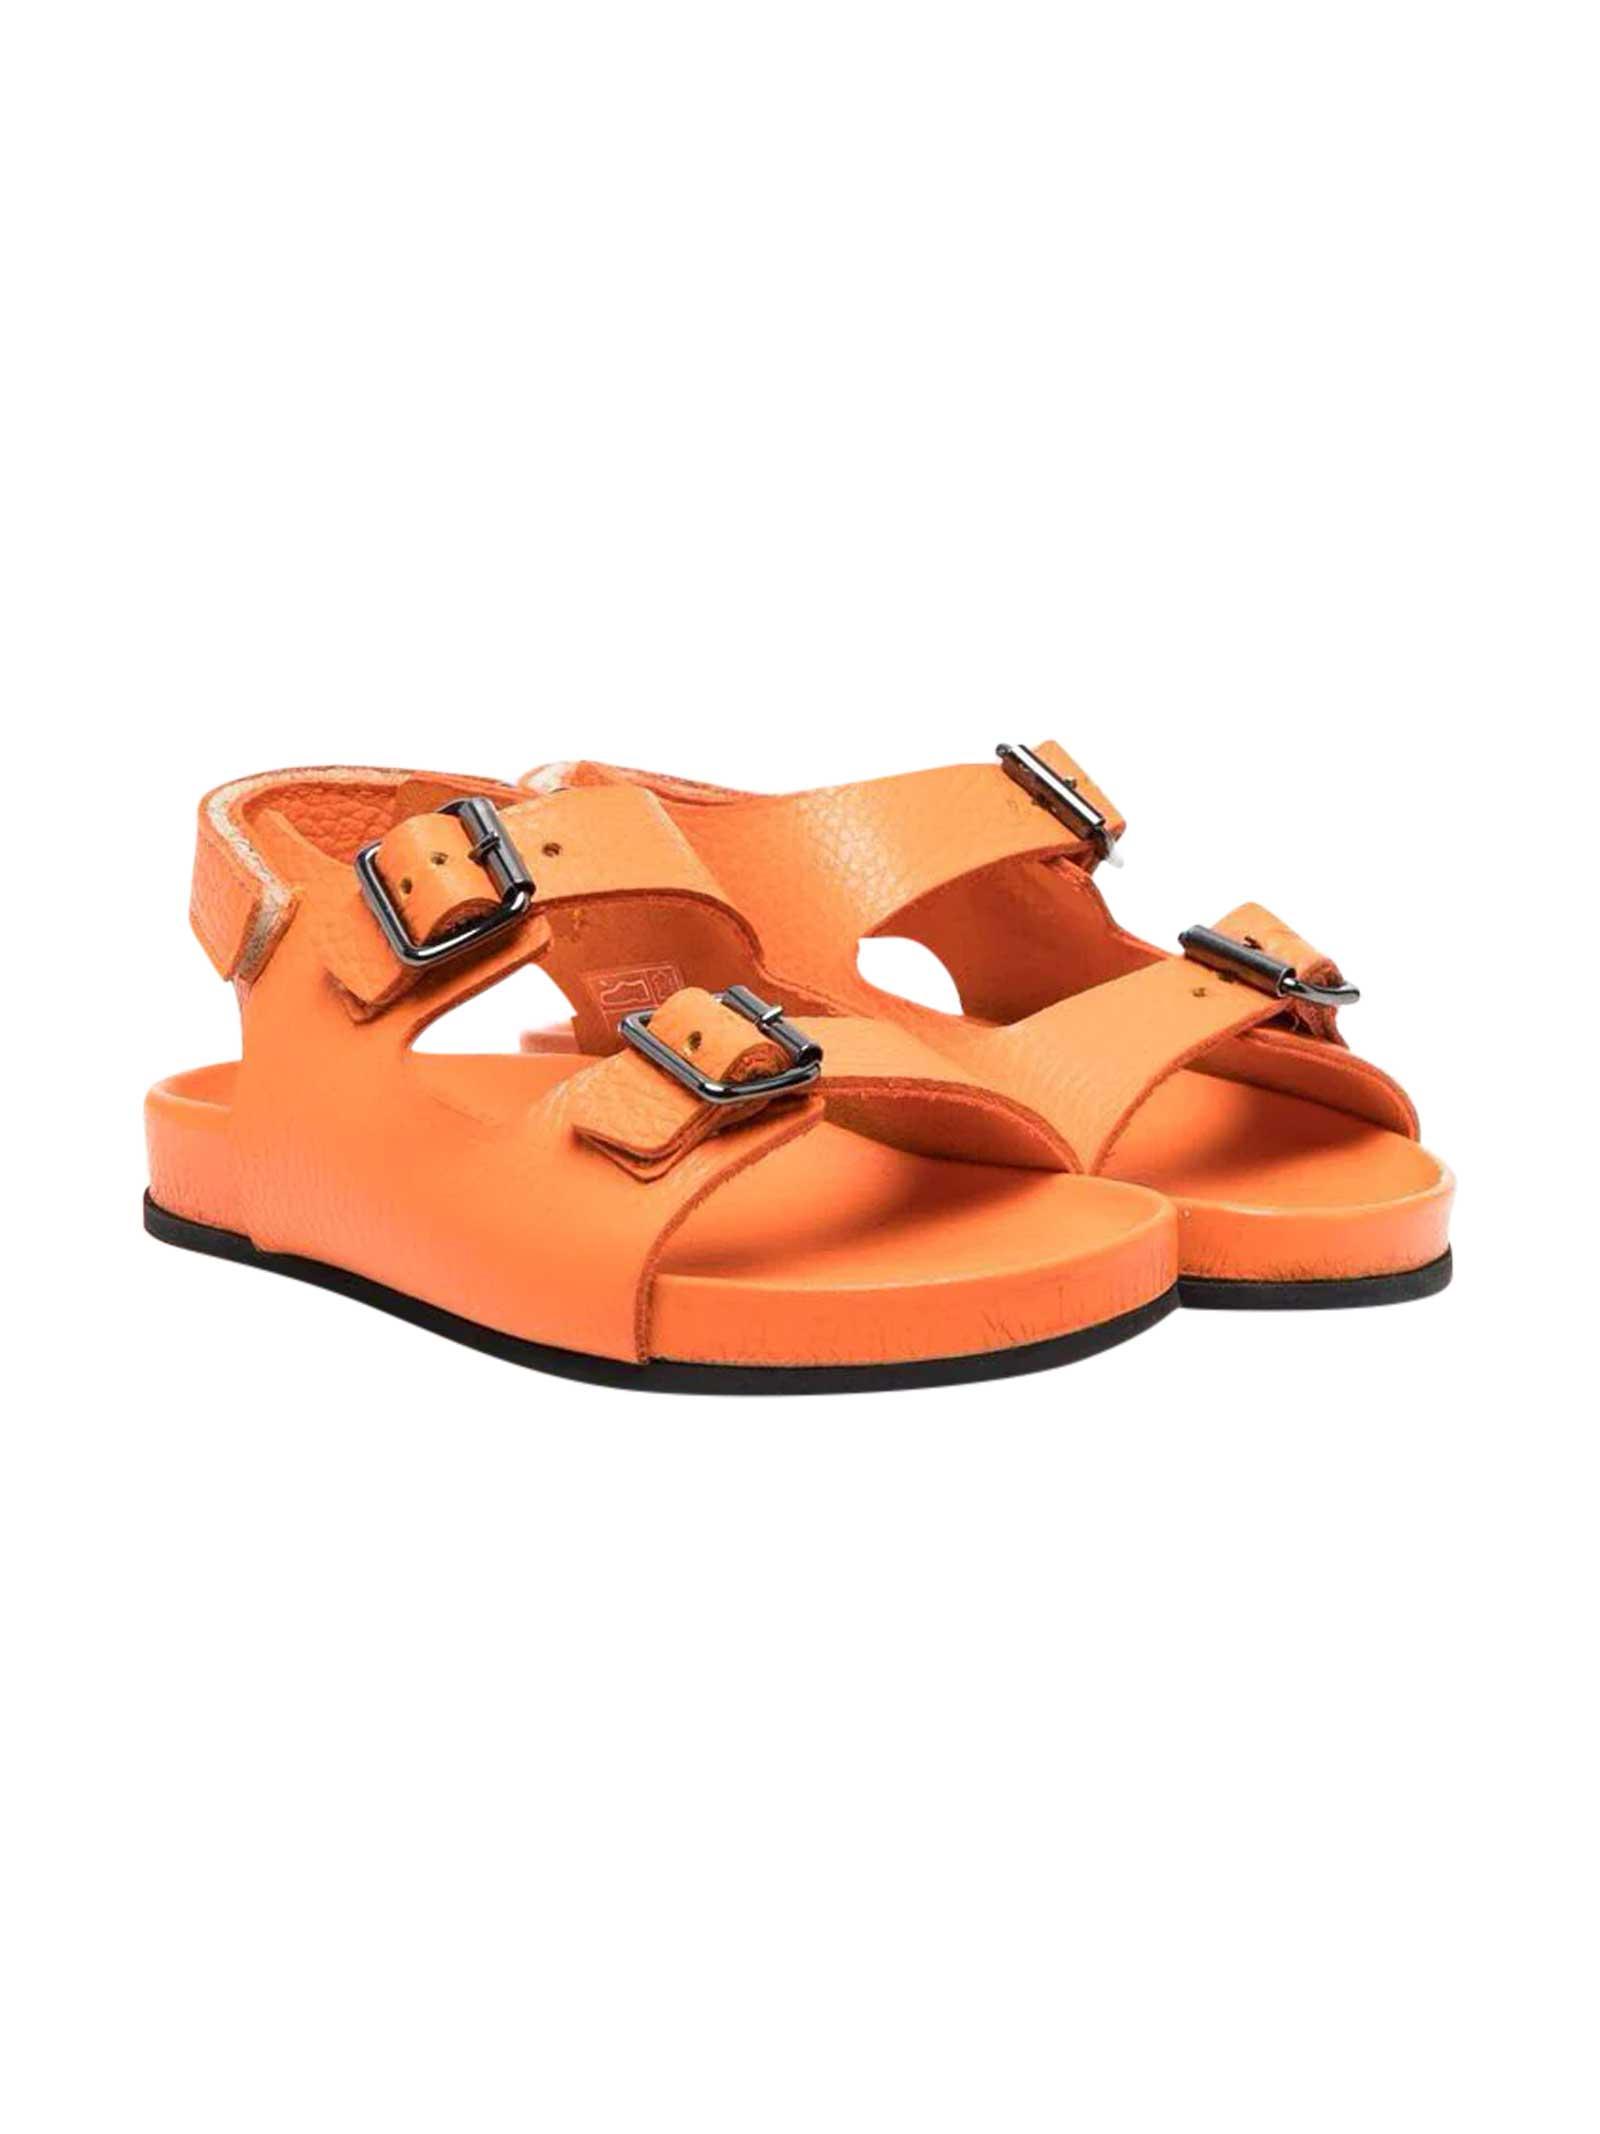 Kids Buckle Sandals